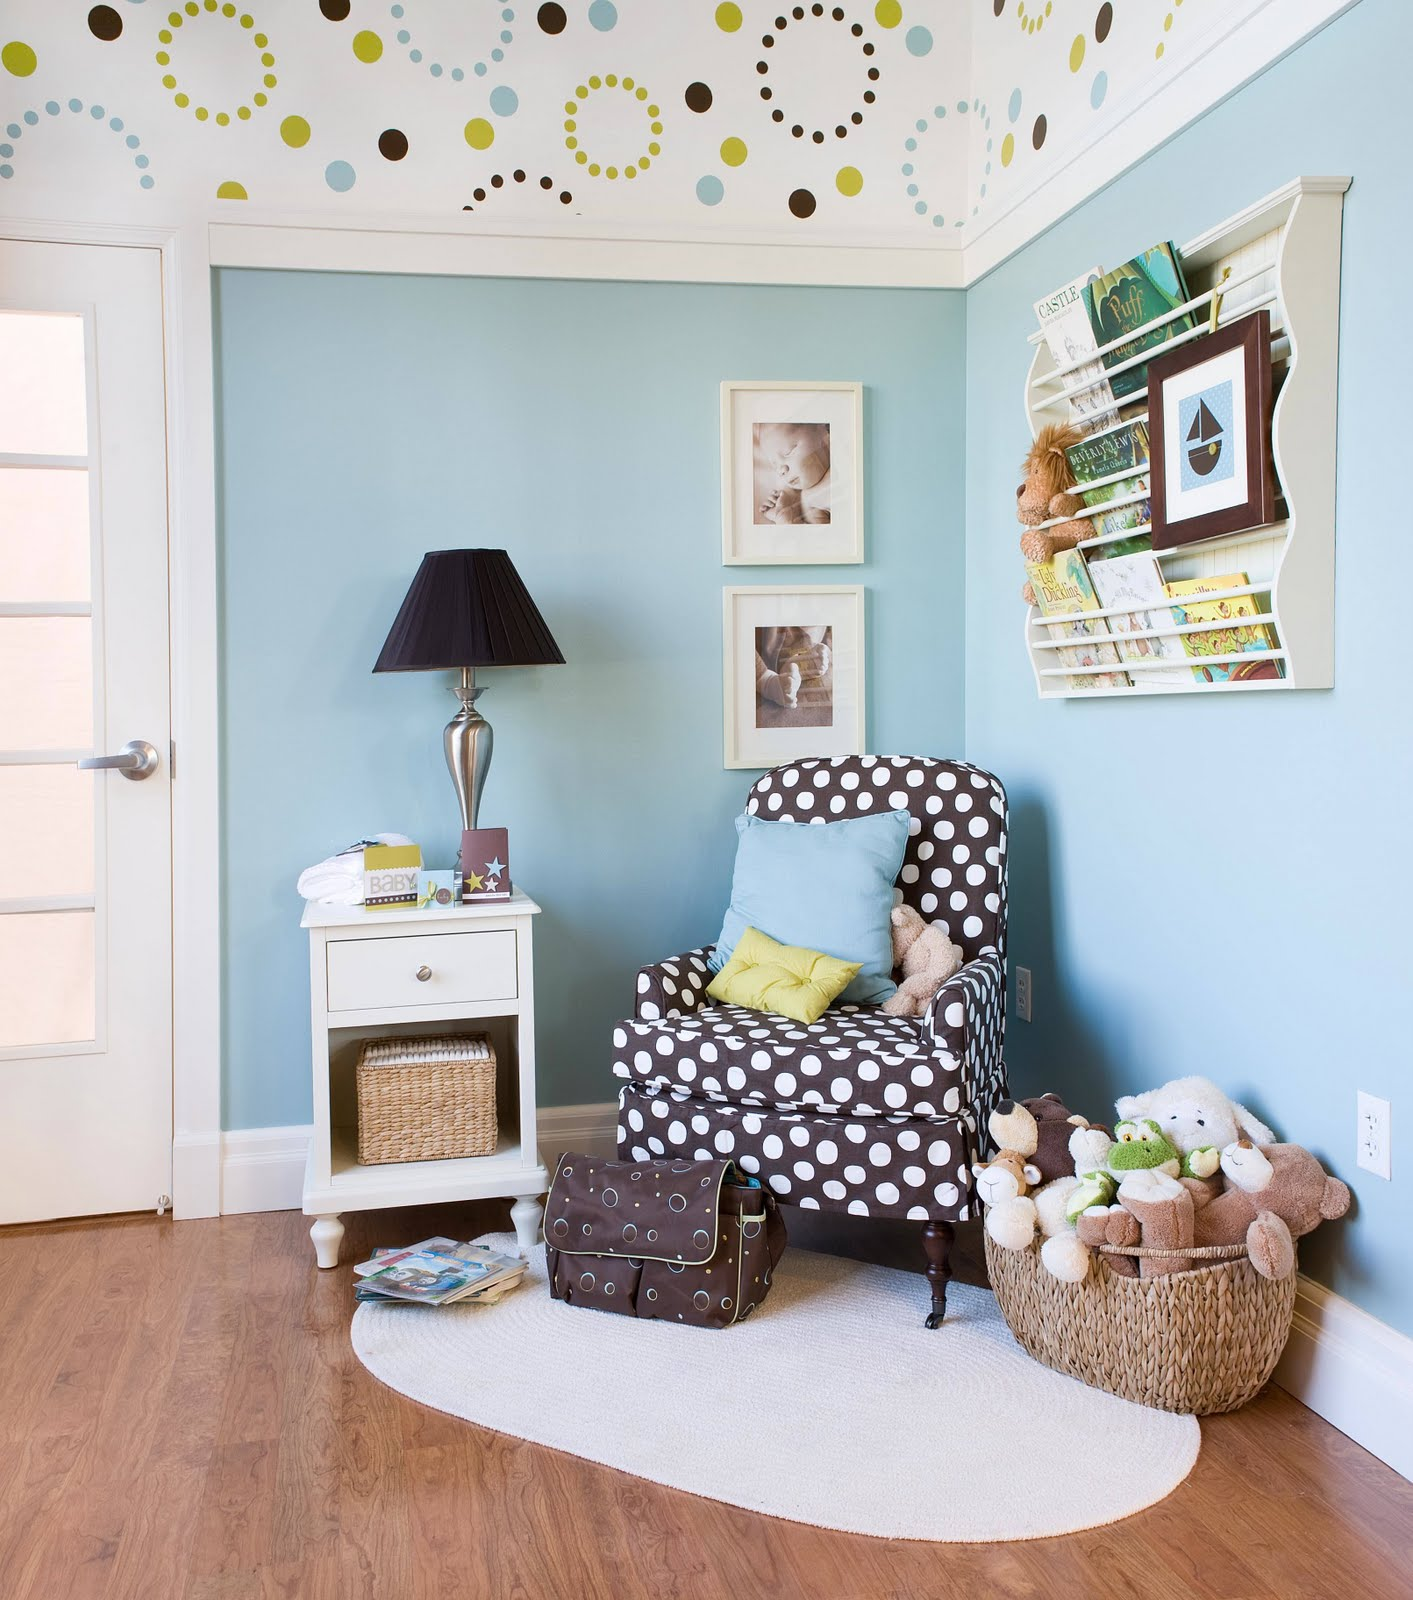 nursery interior design ceilings - photo #11